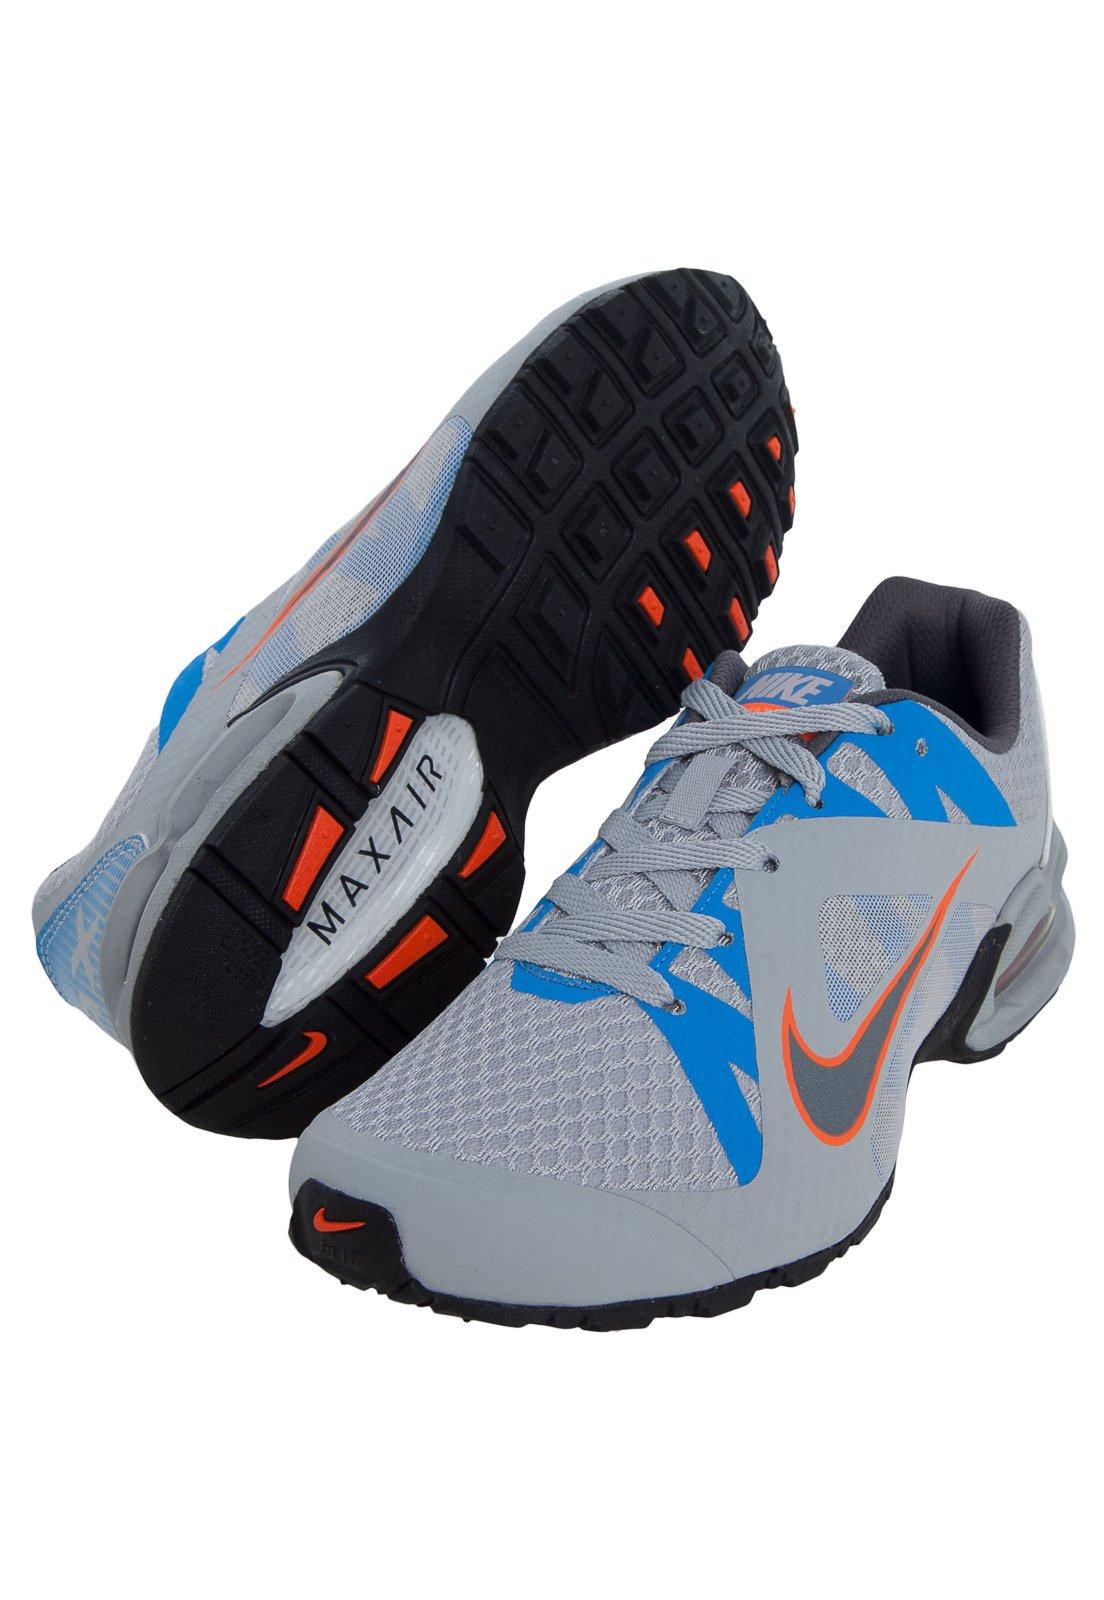 87cd487f9b4 Nike Air Max Lte